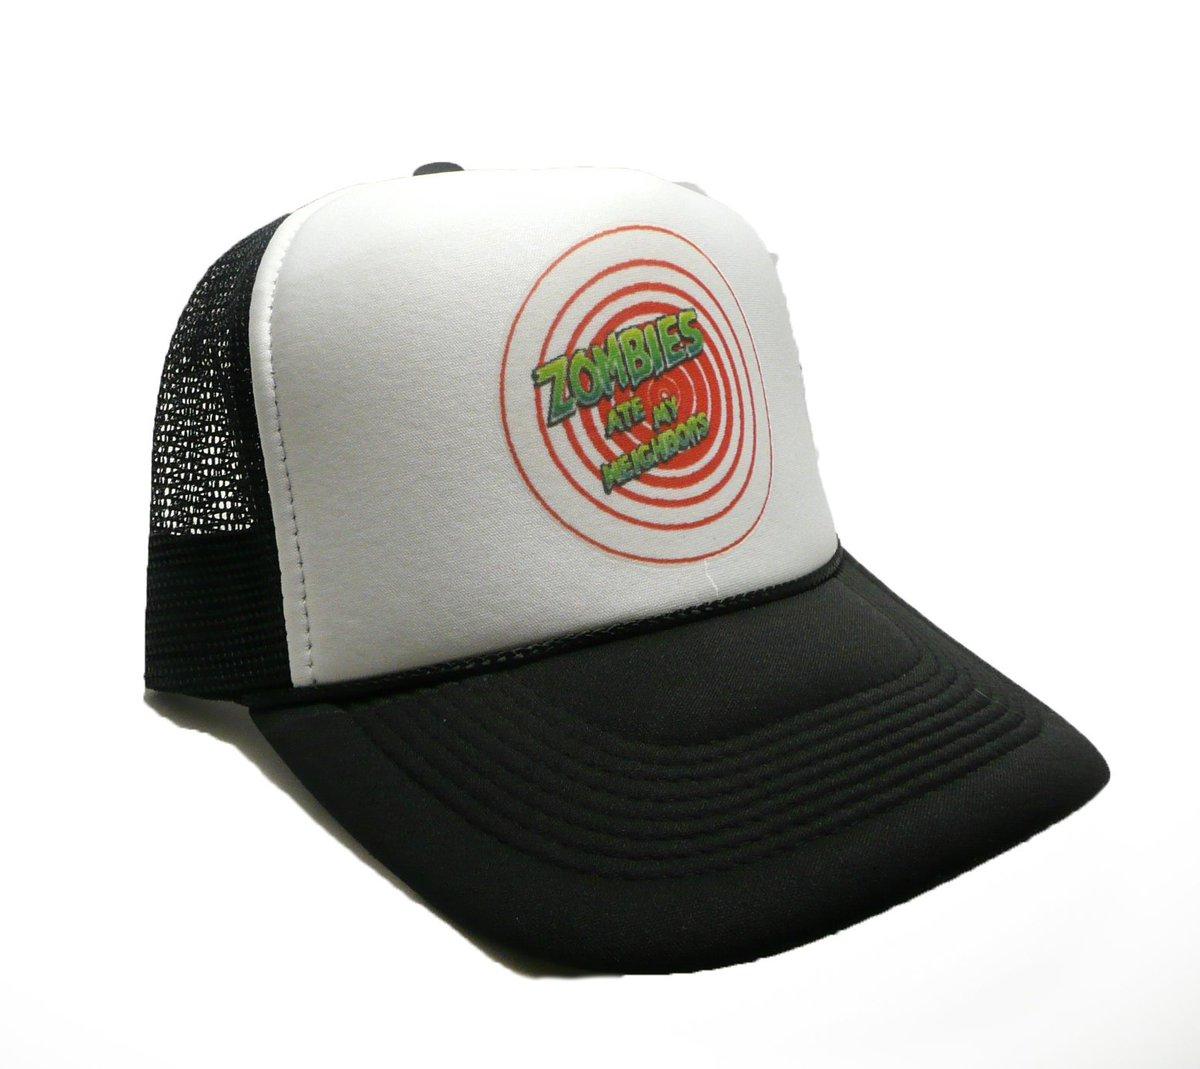 efc2902a ... Neighbors hat trucker hat adjustable snap back gamer hat black new  unworn https://etsy.me/2DzB4Jz #accessories #hat #black #white #gamerhat # truckerhat ...